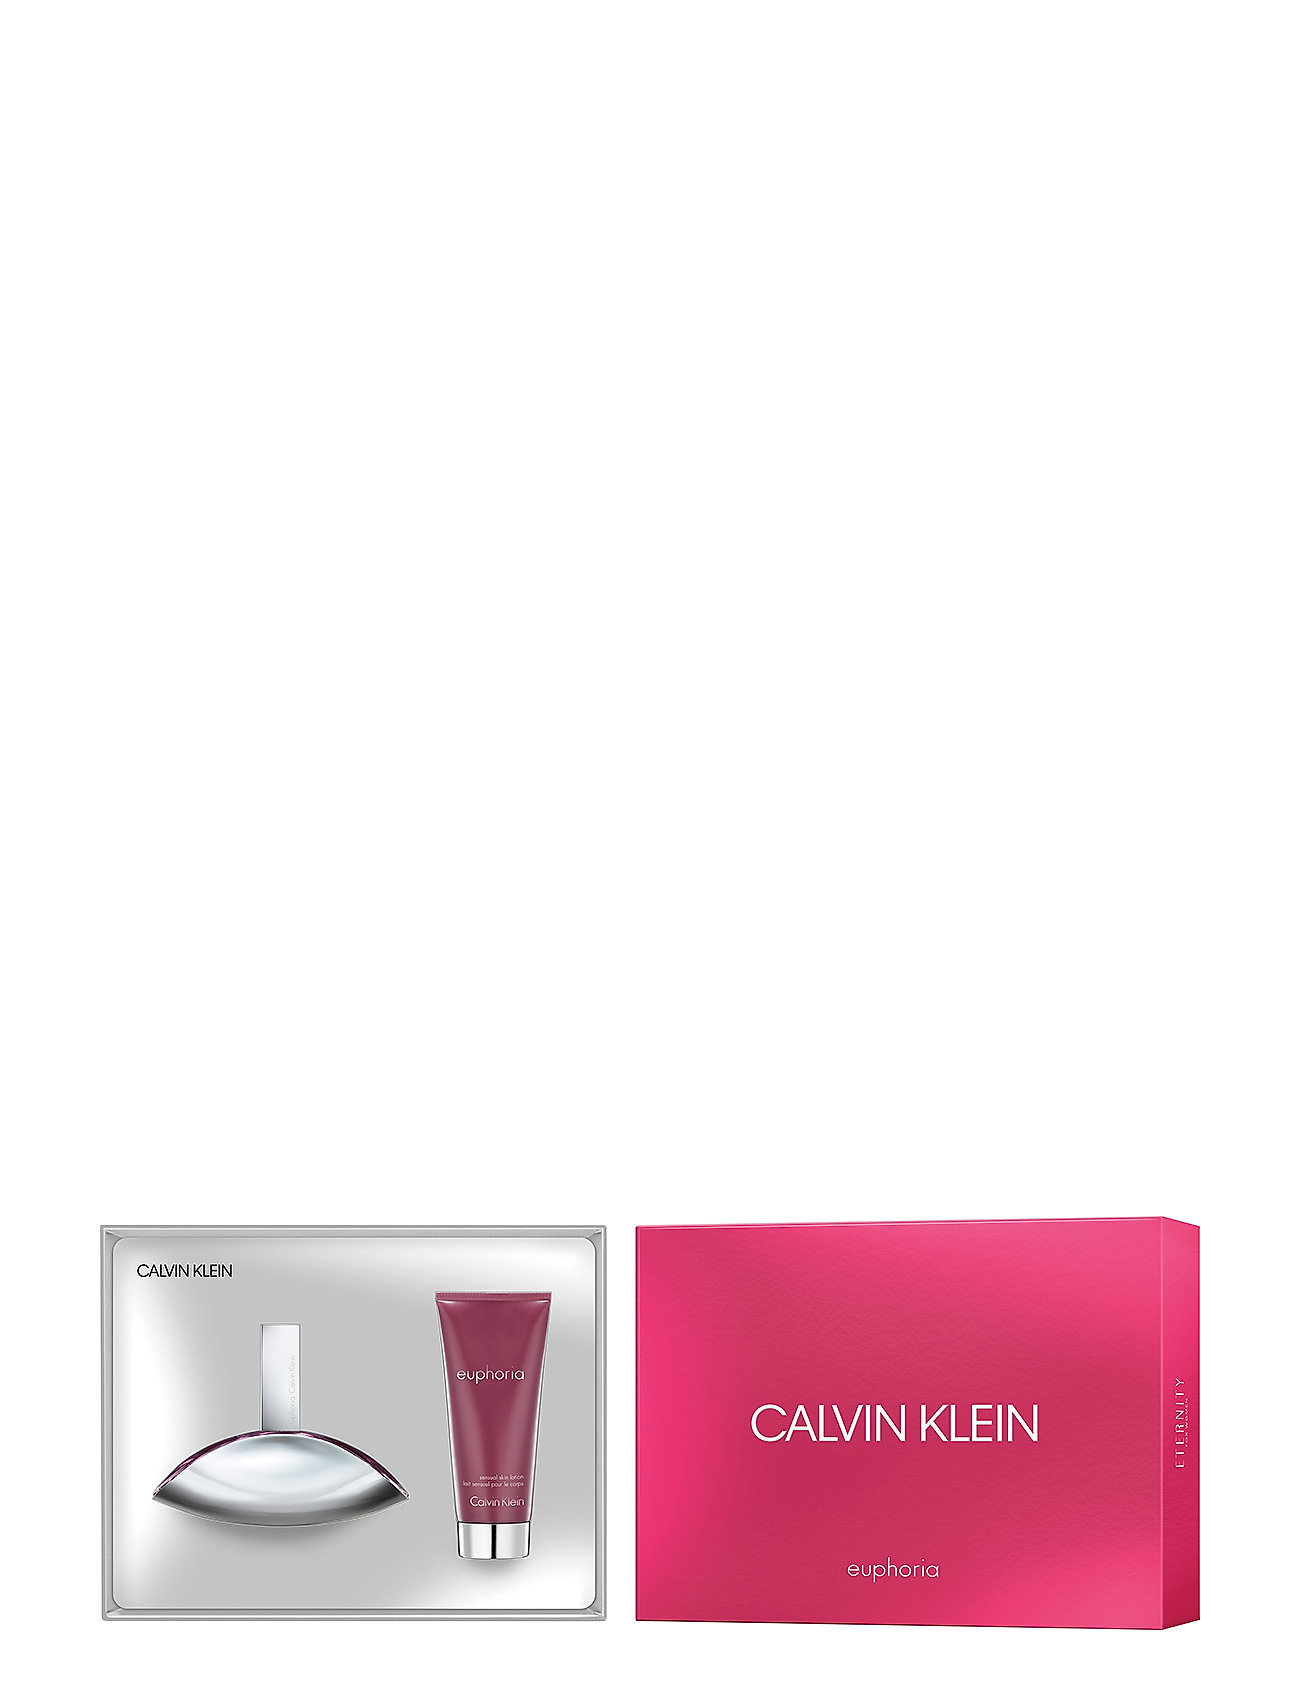 Image of Euphoria Edp 30ml/Bodylotion 100ml Beauty WOMEN Skin Care Perfume Sets Body Care Creams & Lotions & Bodybutter Calvin Klein Fragrance (3086028105)